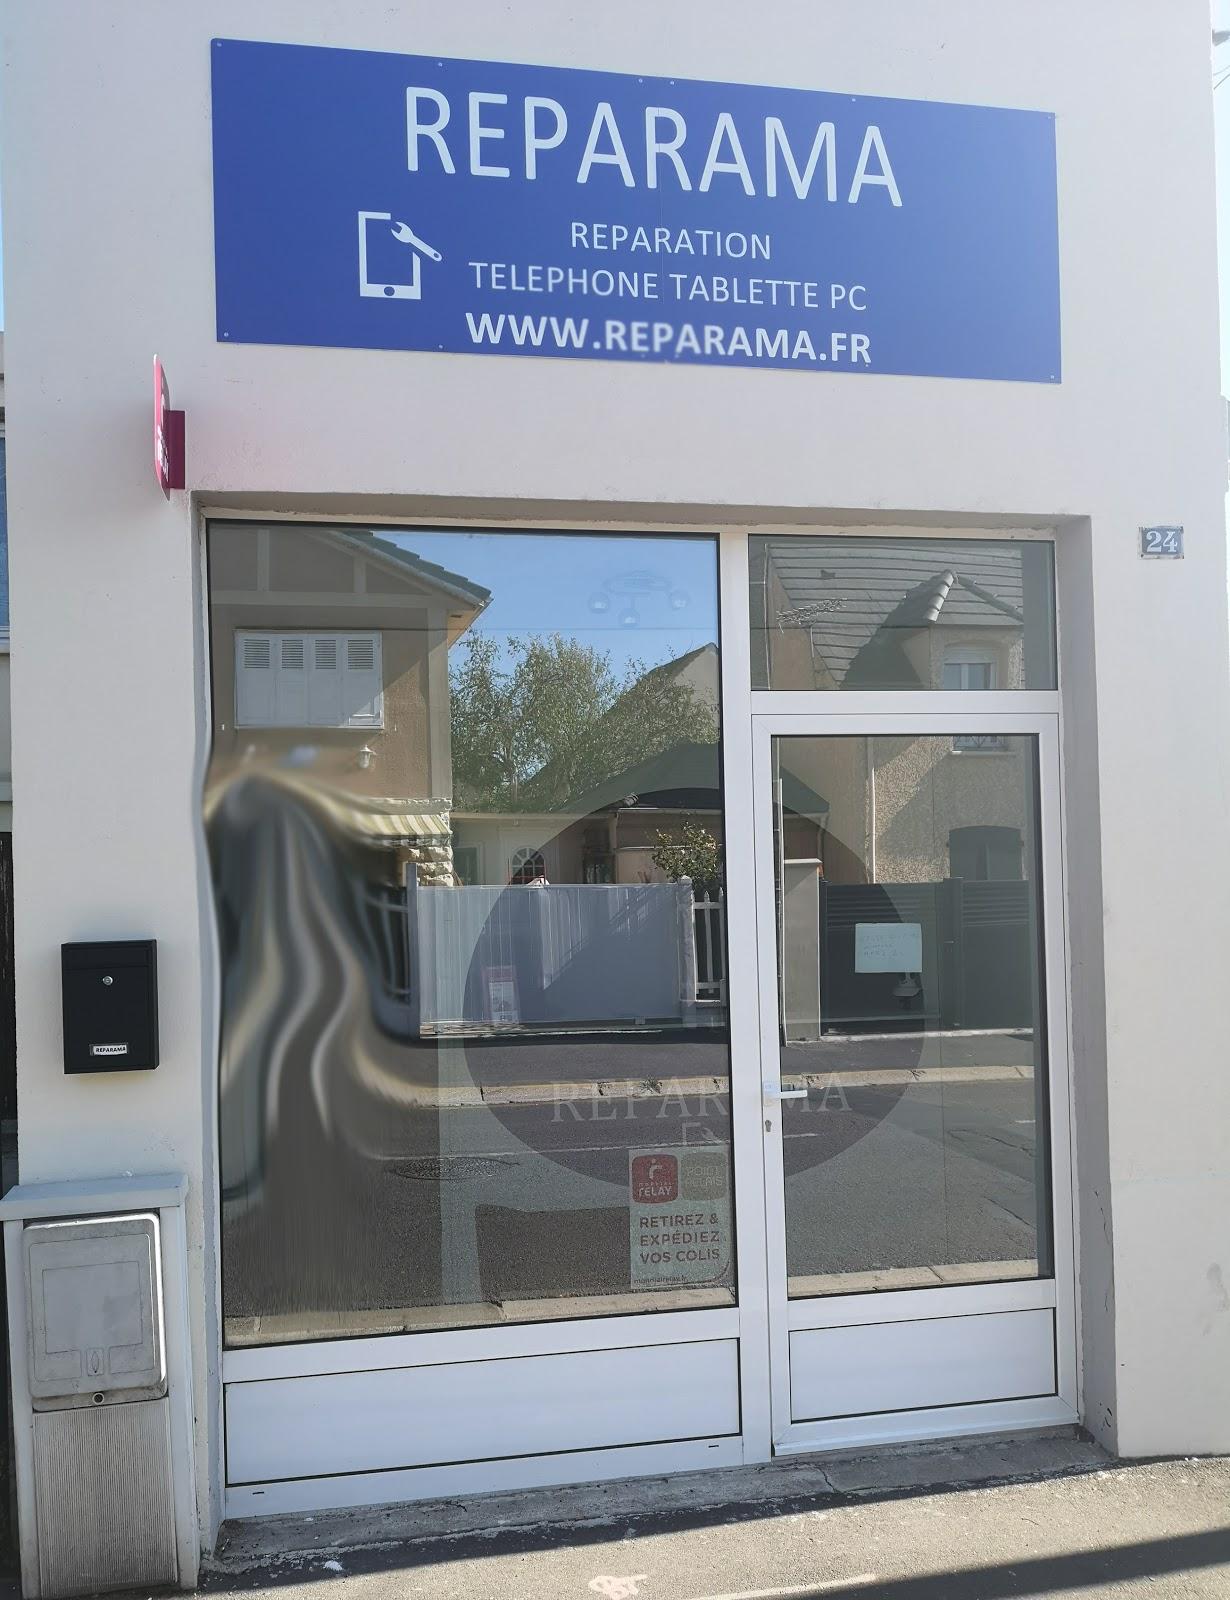 photo de la boutique de Reparama Reparation Telephone